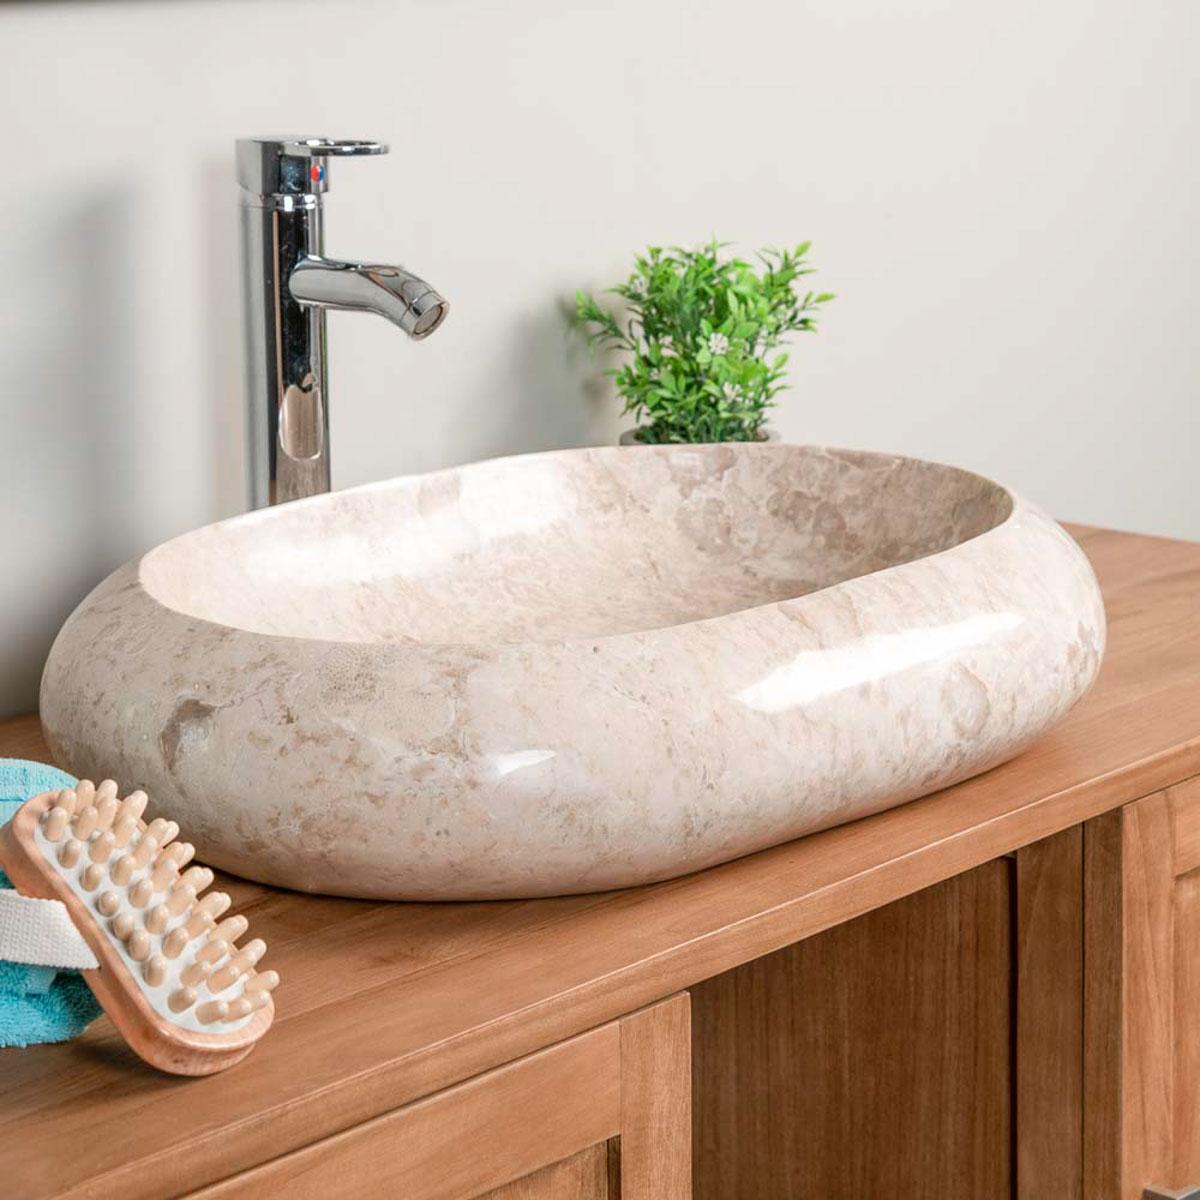 vasque poser en marbre murano rectangle cr me l 60 cm. Black Bedroom Furniture Sets. Home Design Ideas